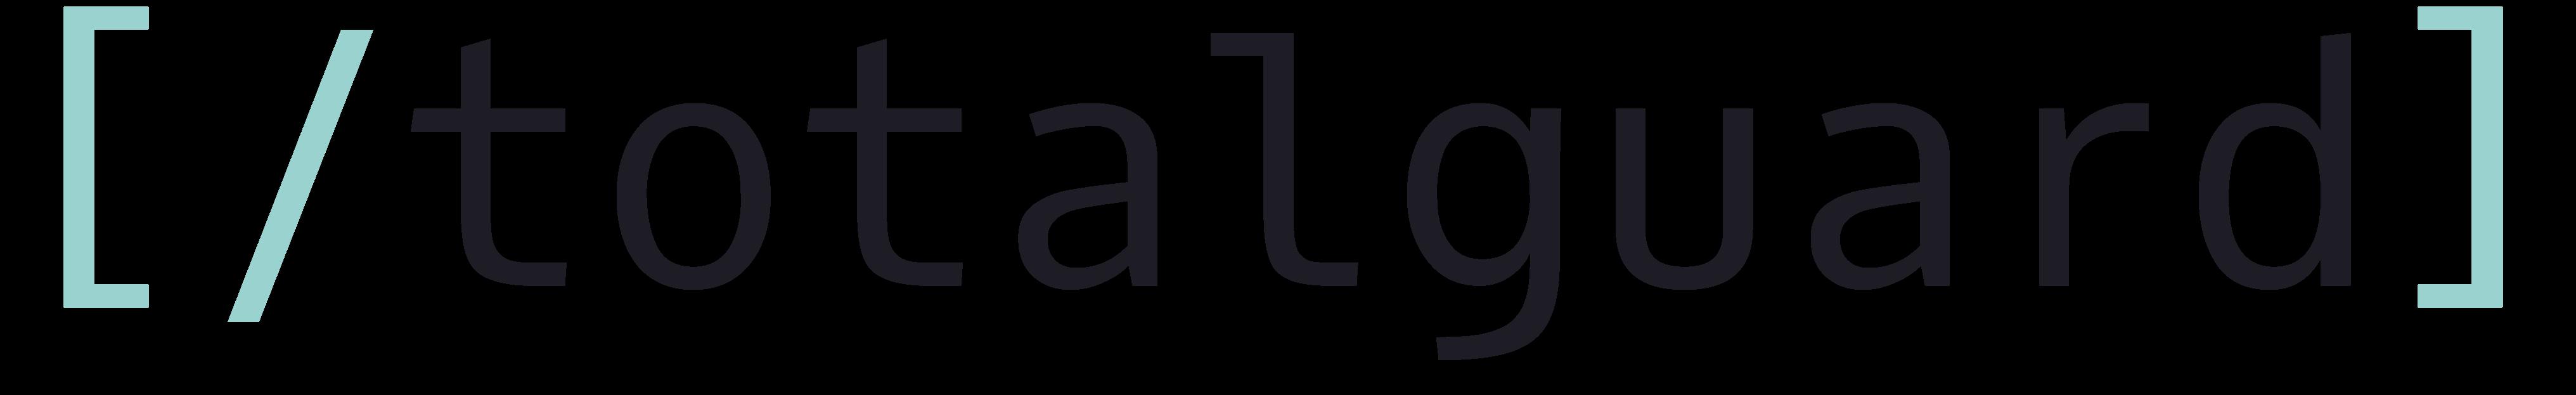 Total guard logo